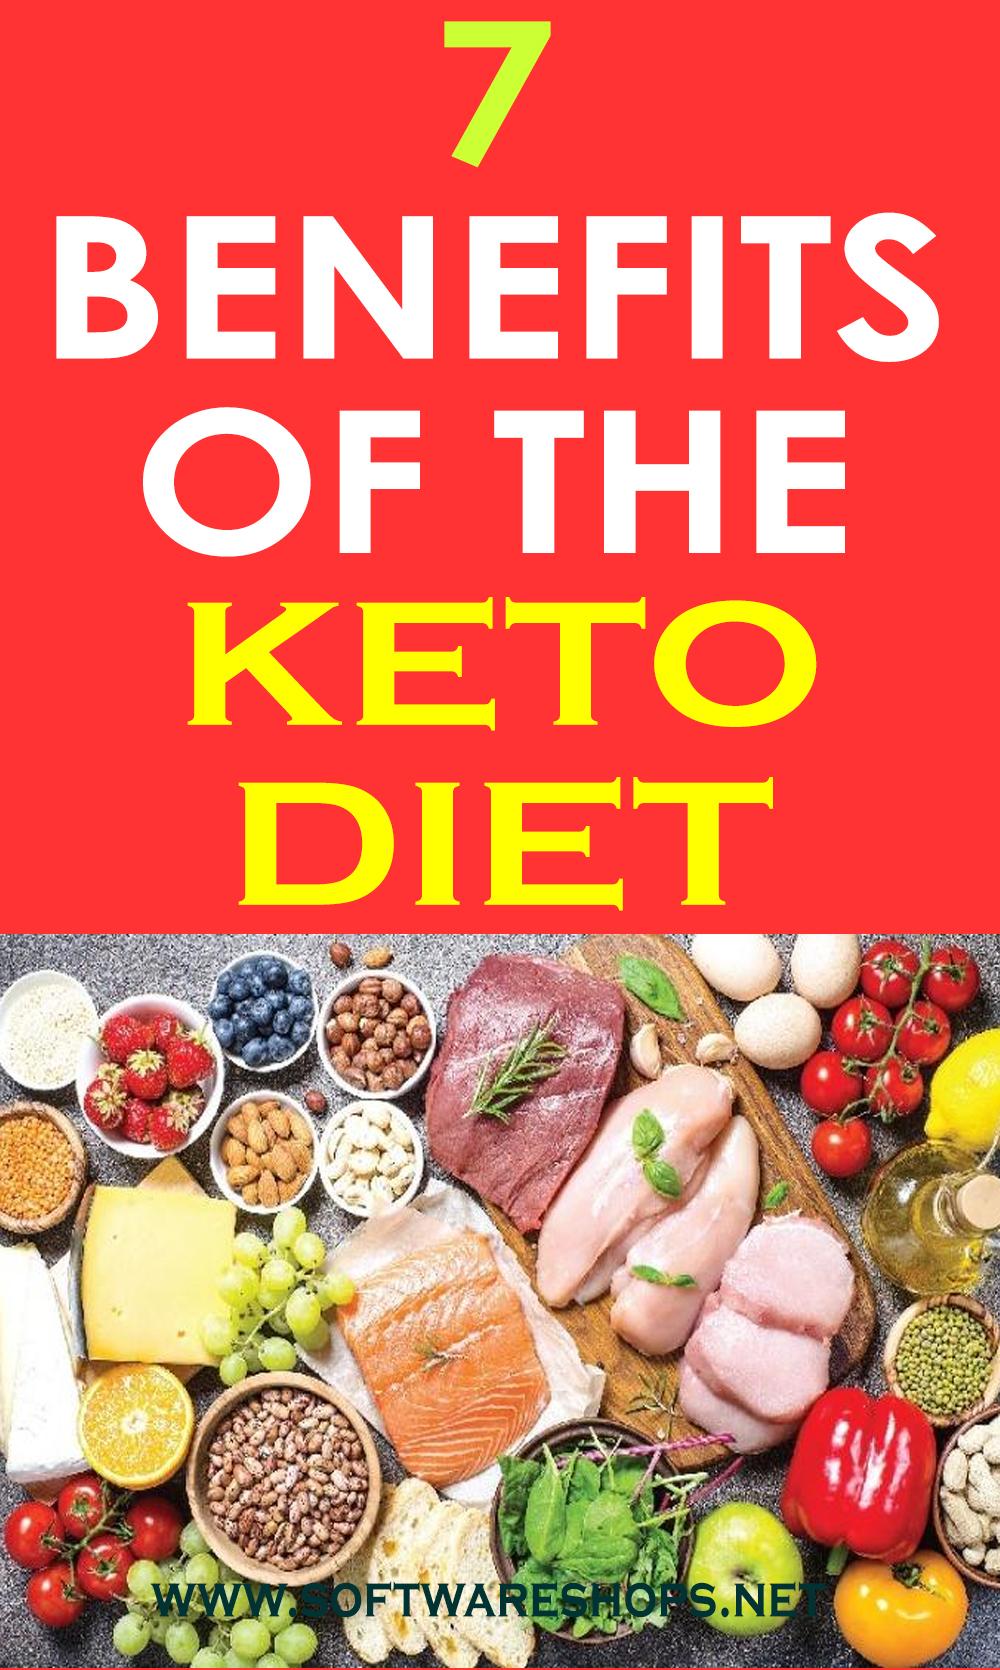 7 BENEFITS OF KETO DIET